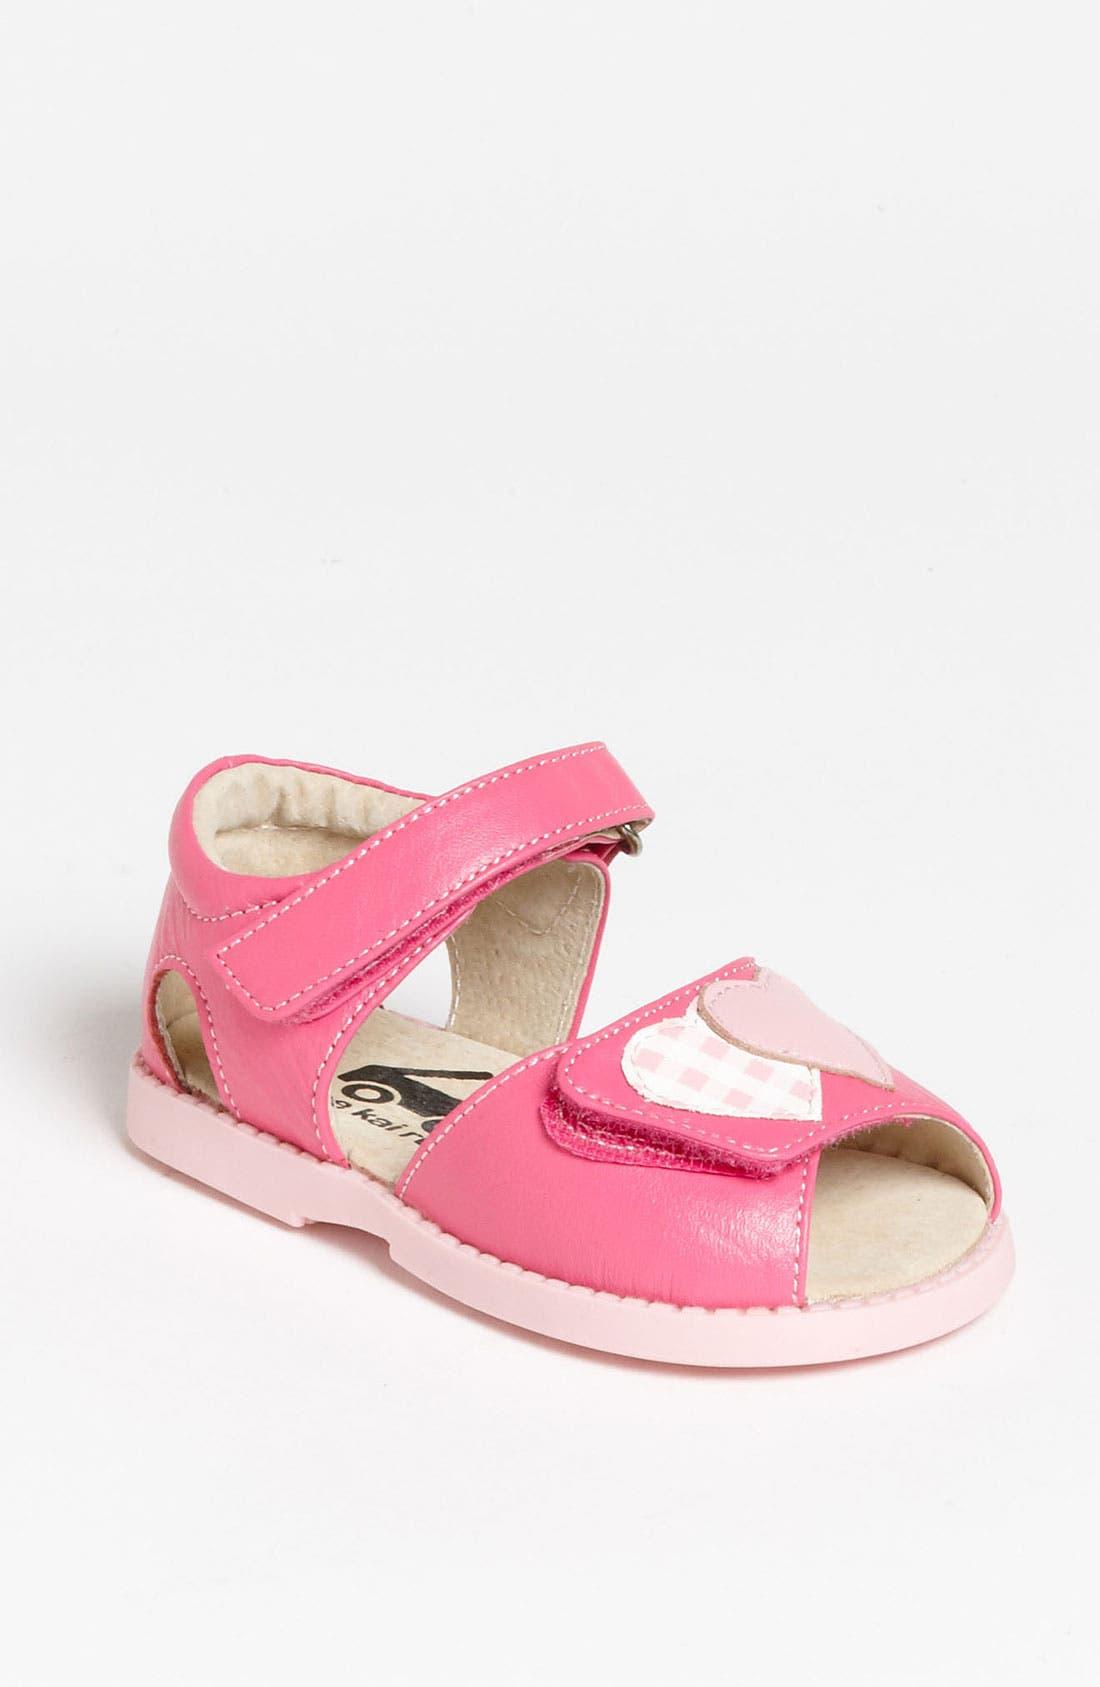 Alternate Image 1 Selected - See Kai Run 'Penelope' Sandal (Baby, Walker & Toddler)